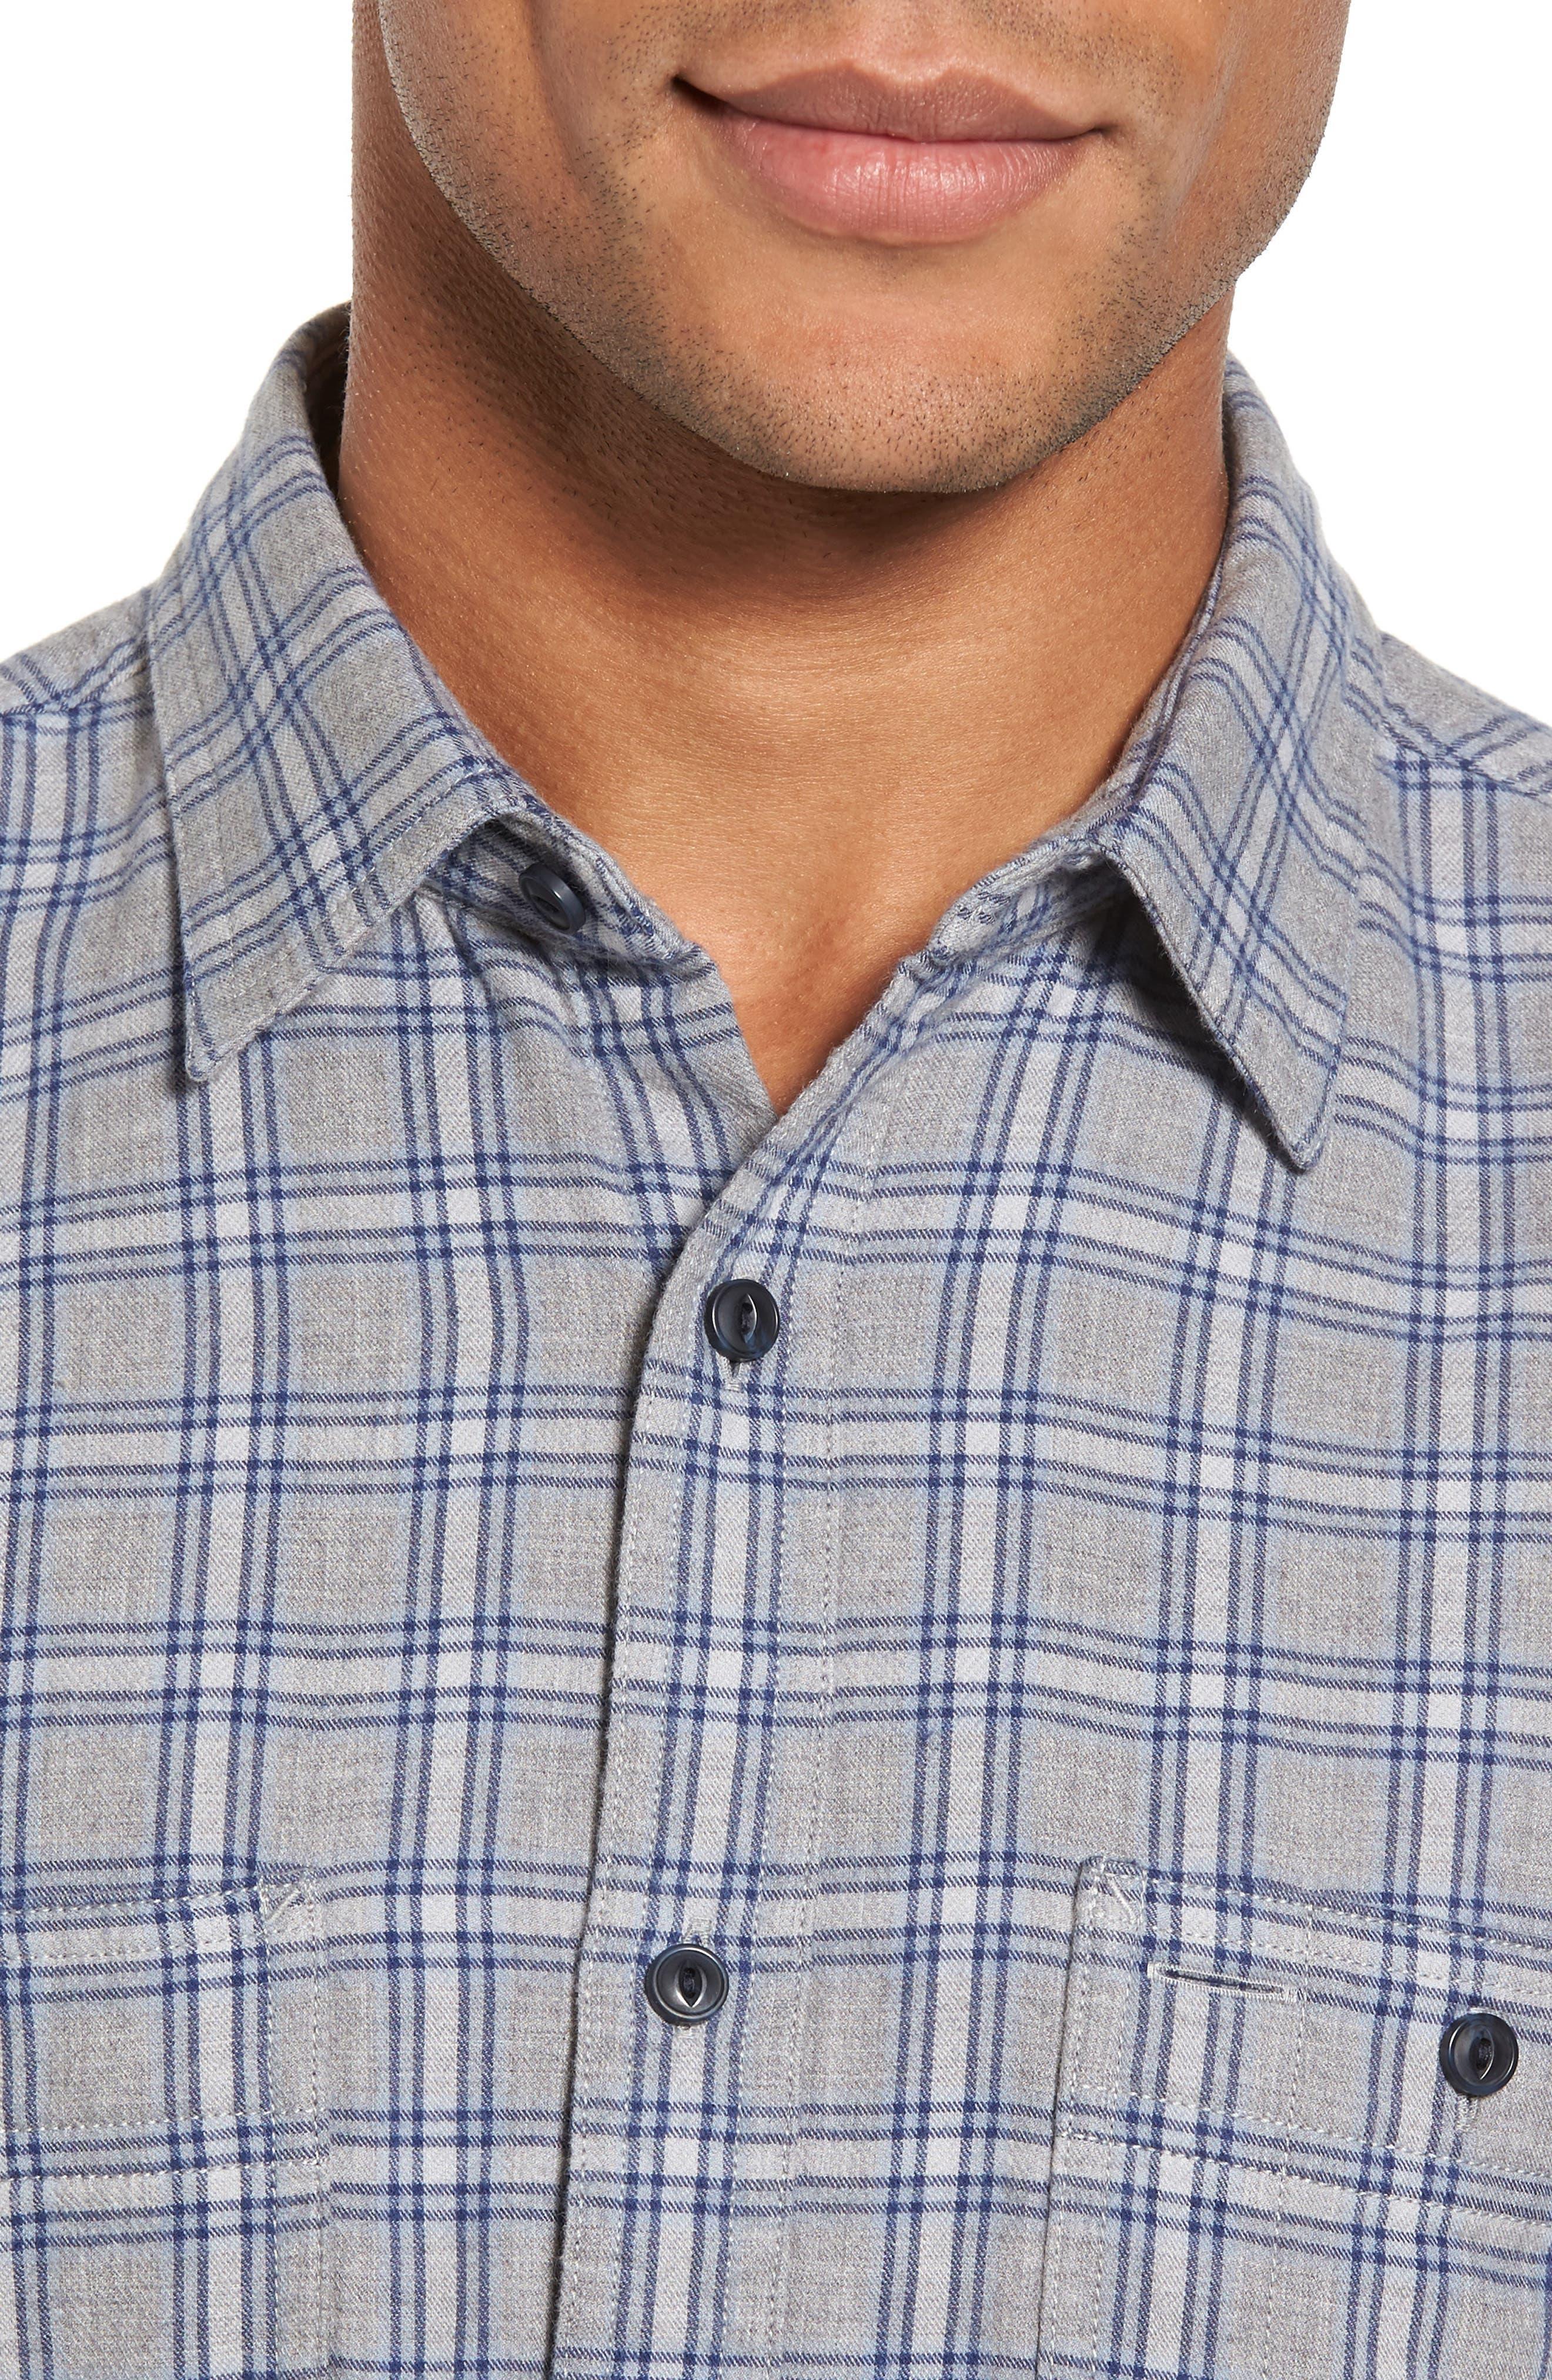 Workwear Duofold Check Sport Shirt,                             Alternate thumbnail 4, color,                             Navy Iris Grey Plaid Duofold